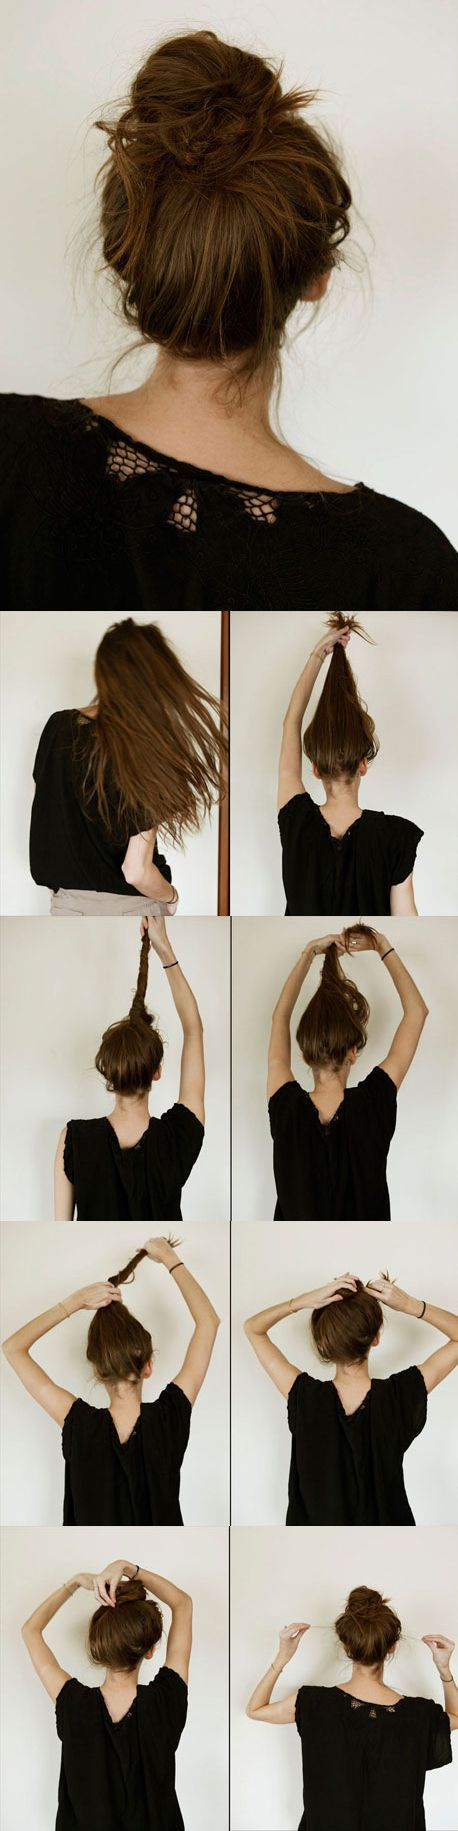 Fun Bun Hair Tutorial That Can Work With Any Outfit Gaya Rambut Simpel Gaya Rambut Cepol Gaya Rambut